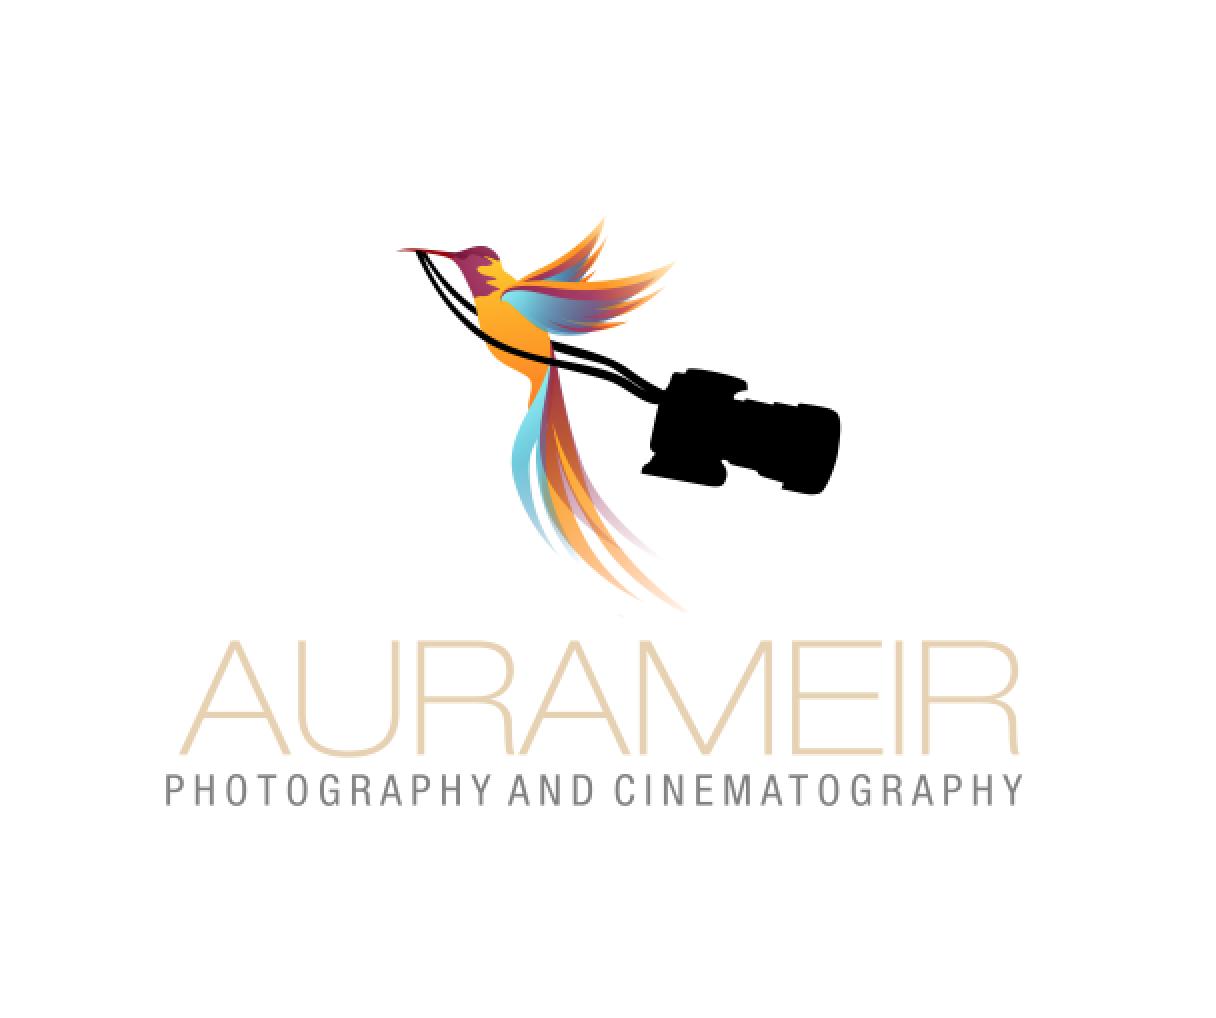 Camera logo design inspiration clipart graphic royalty free library 15 Logo Design Camera Photography PNG Images - Camera Logo Designs ... graphic royalty free library